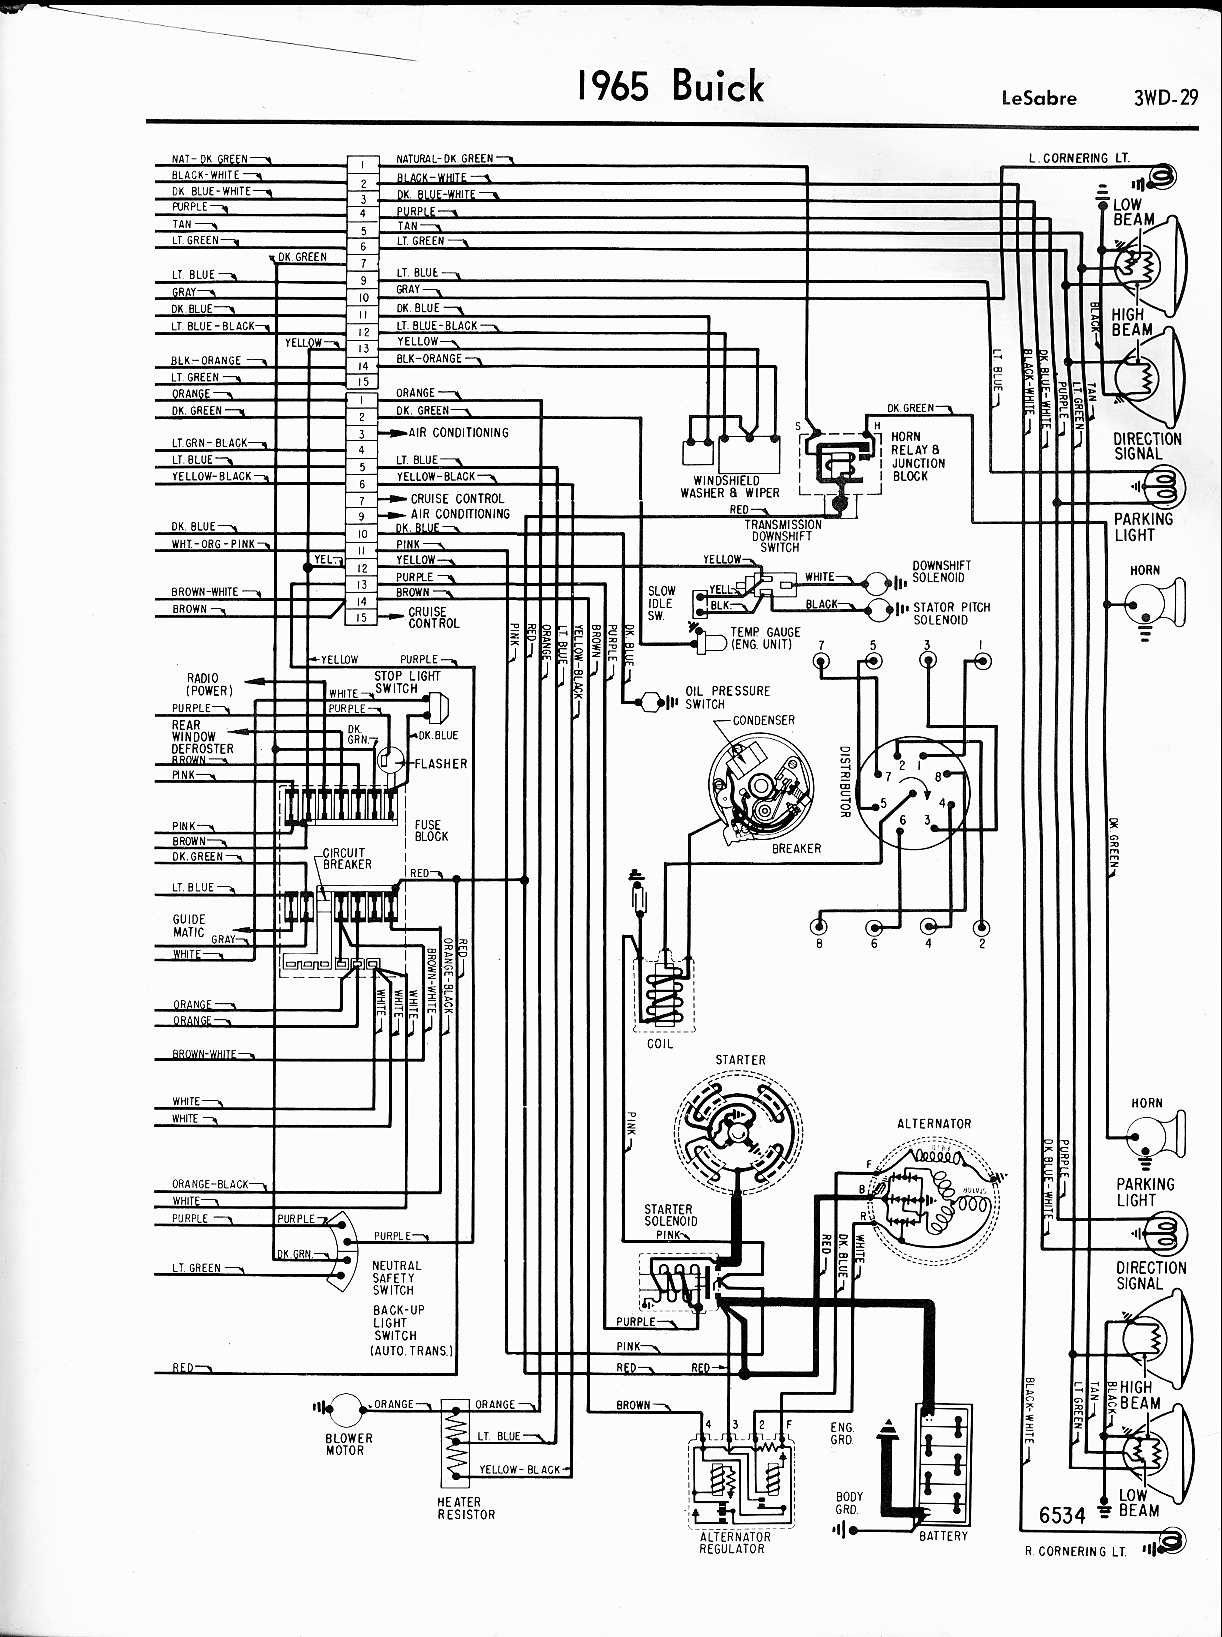 Ford F550 Wiring Diagram For Alt